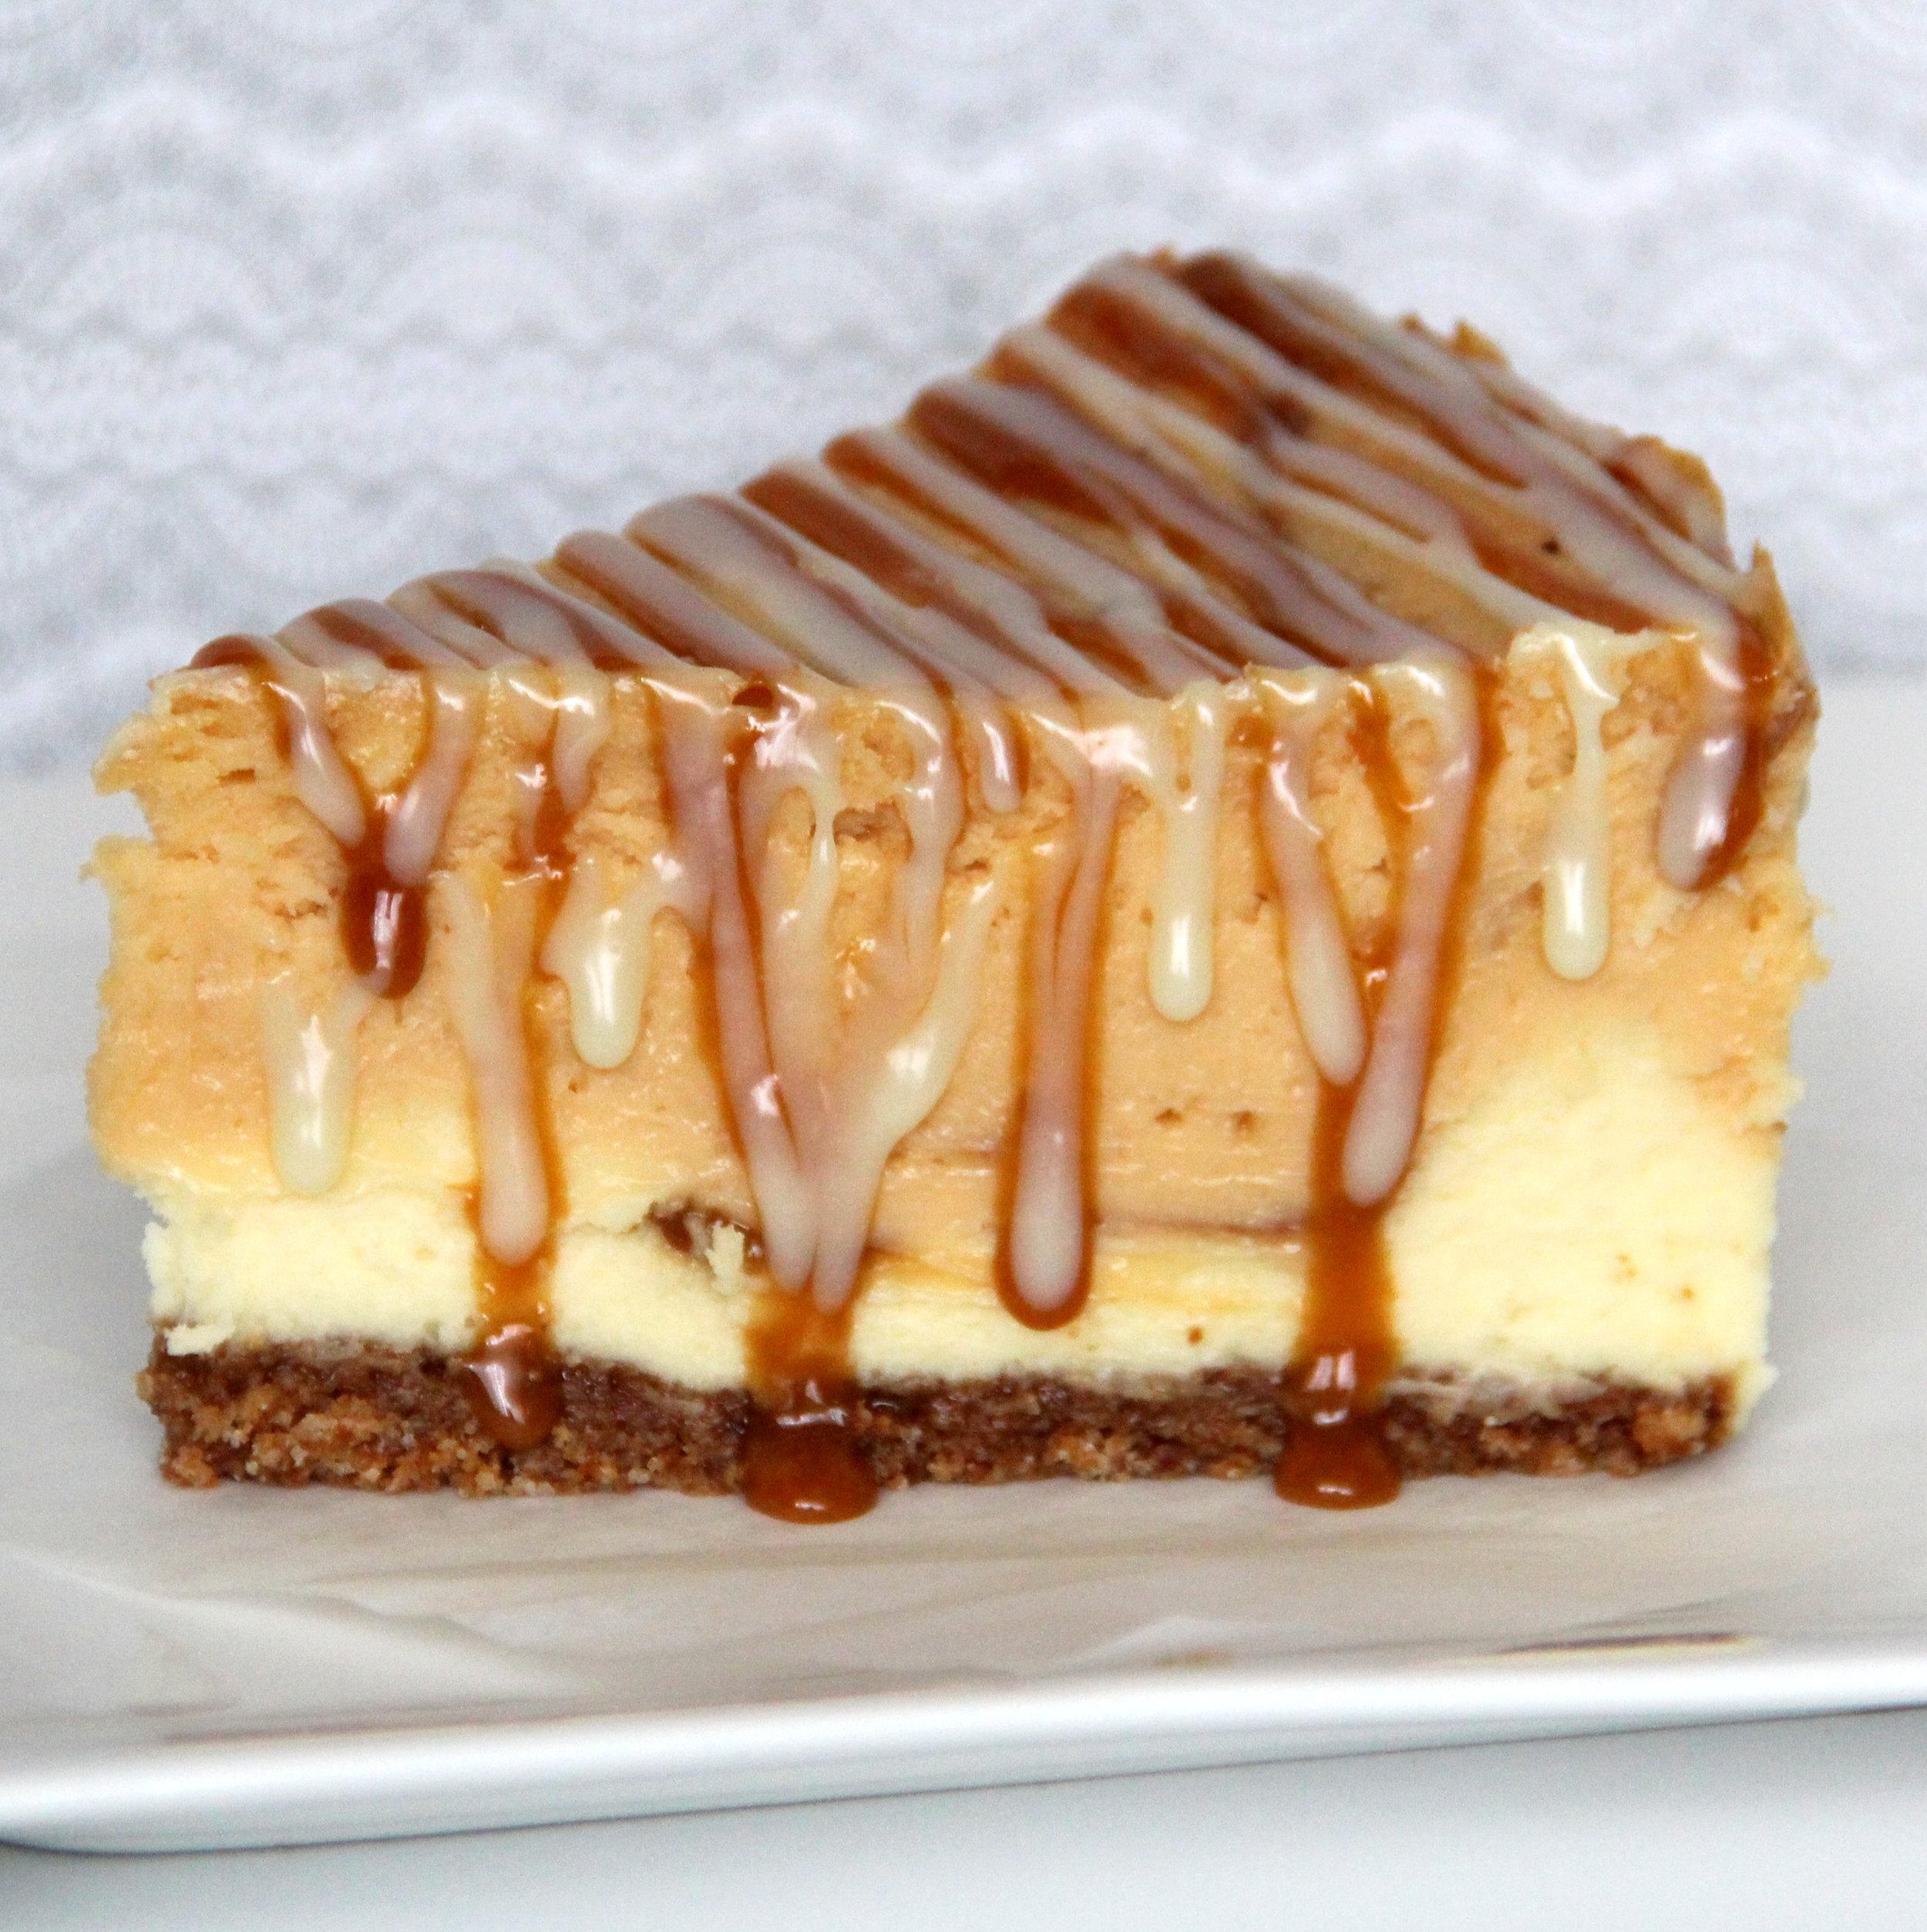 Butterscotch Caramel White Chocolate Cheesecake